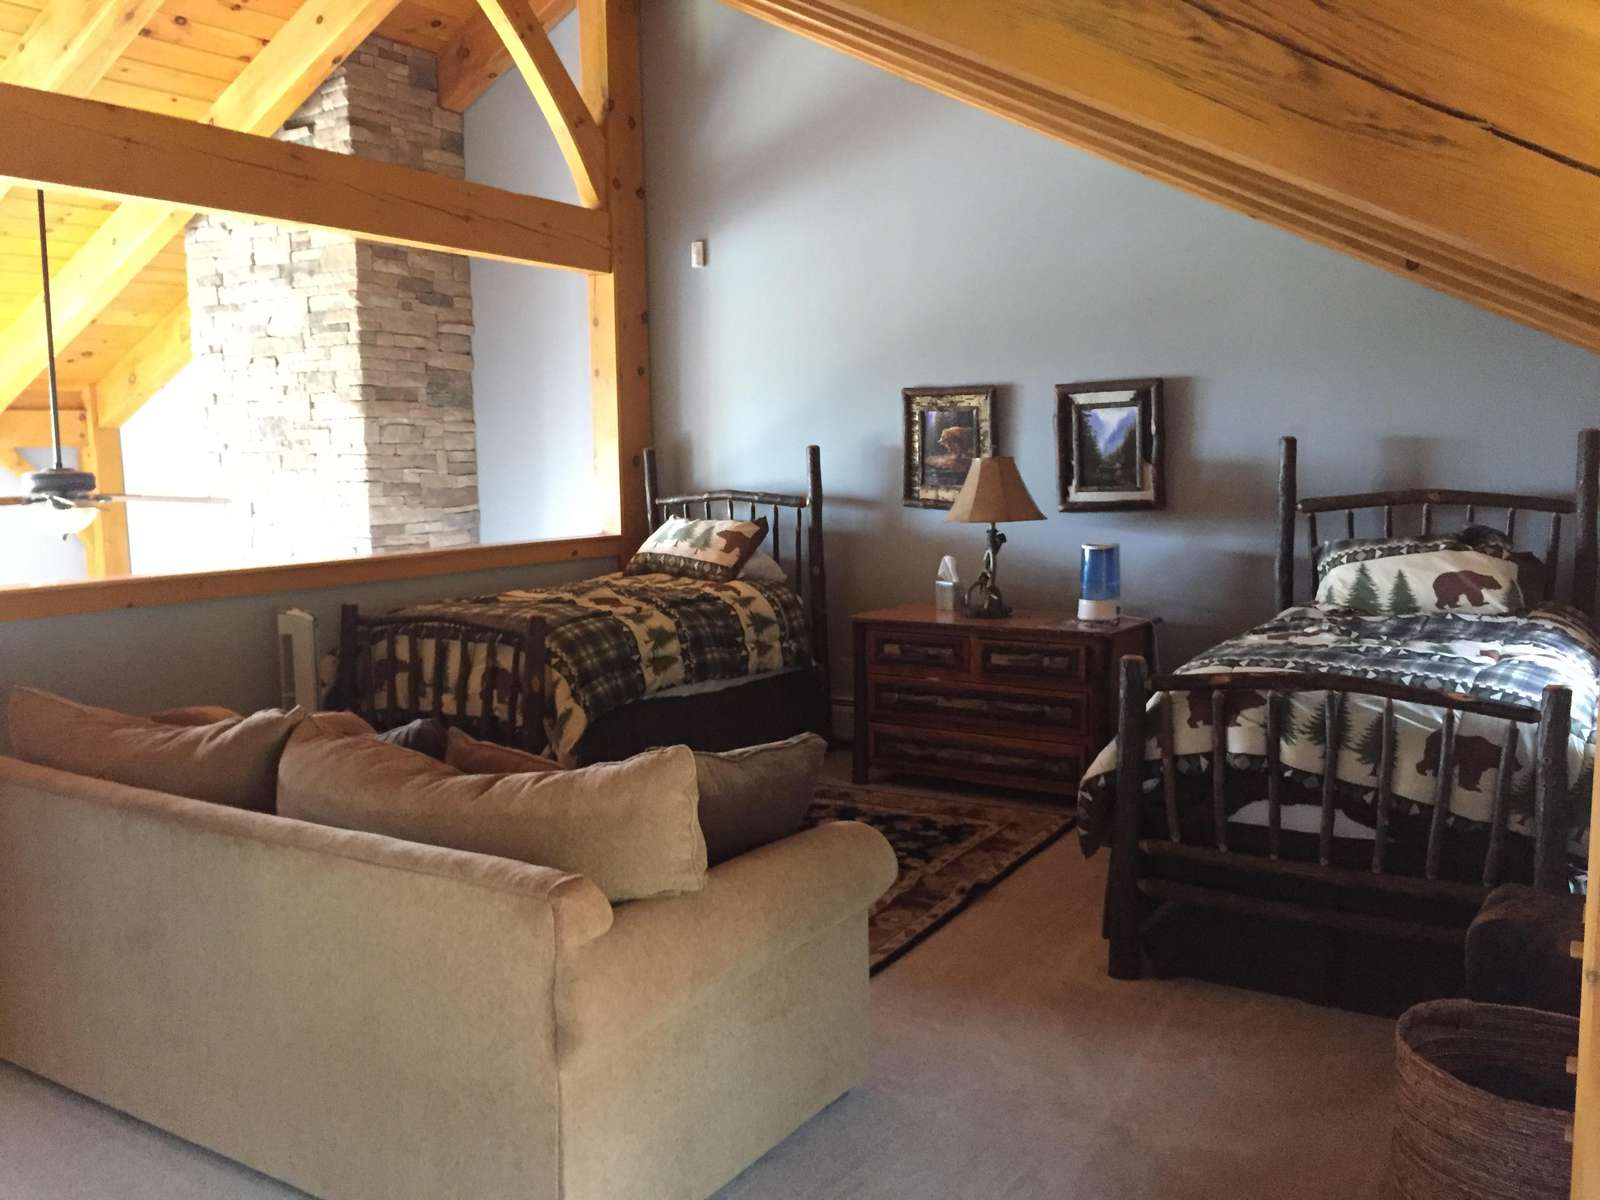 Upper level loft bedroom